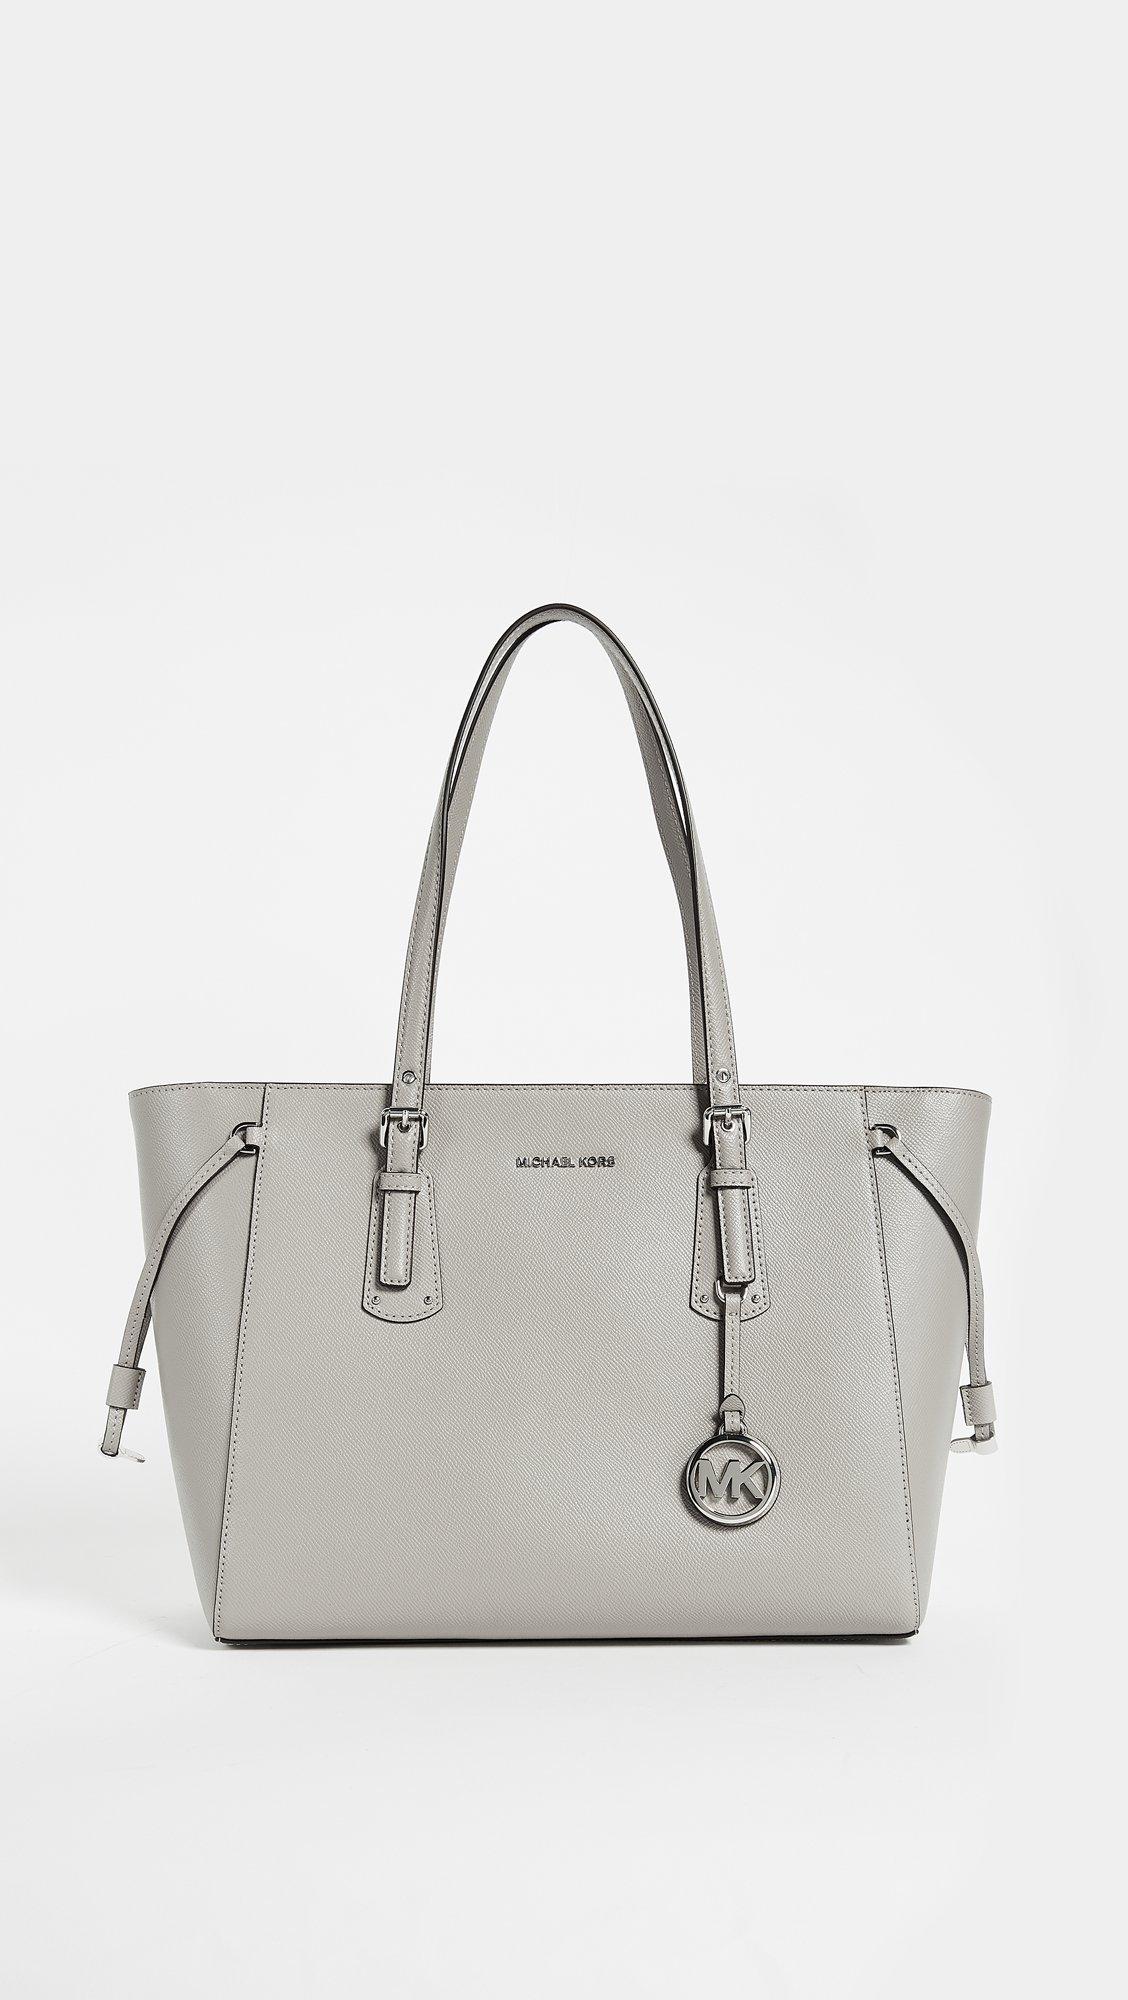 Michael Kors New Voyager Pearl Gray Tote Pebble Leather Handbag Purse